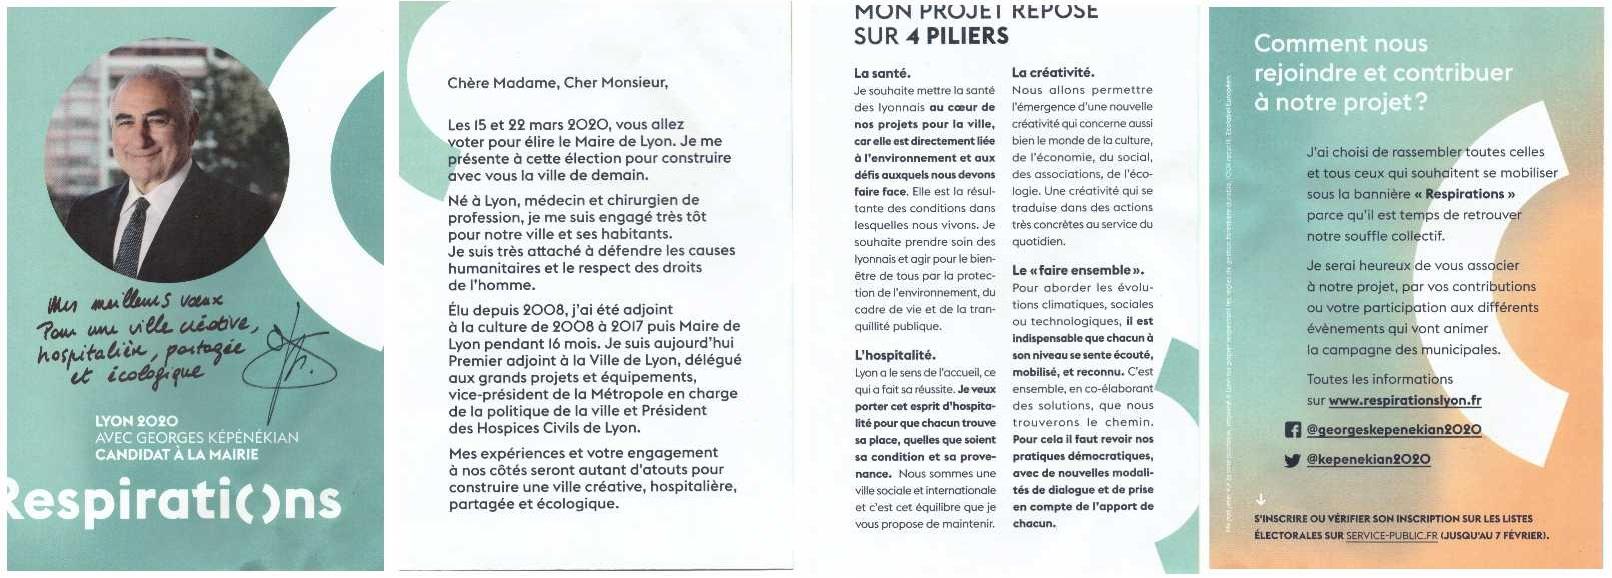 Tract-GeorgesKepenekian